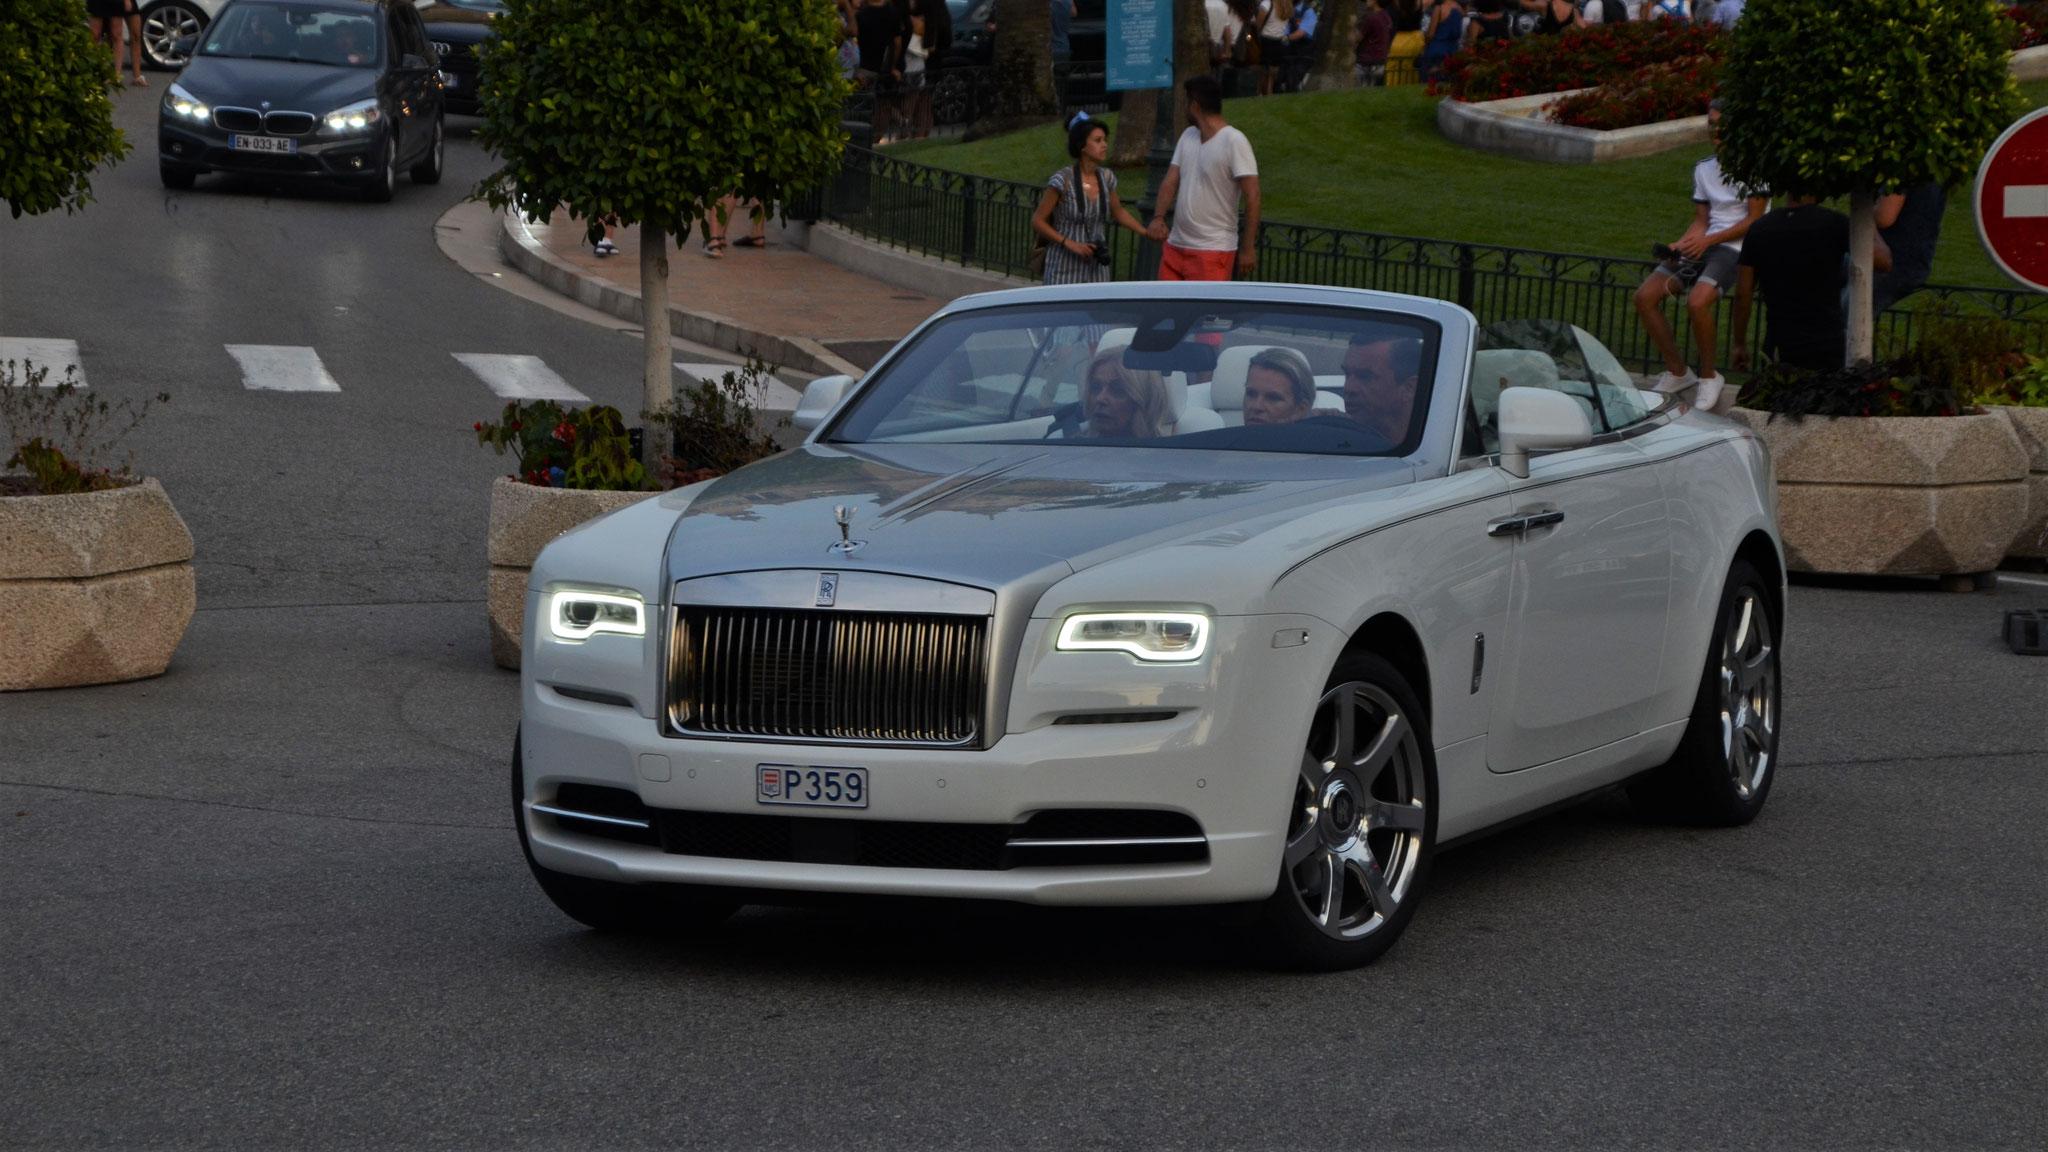 Rolls Royce Dawn - P359 (MC)